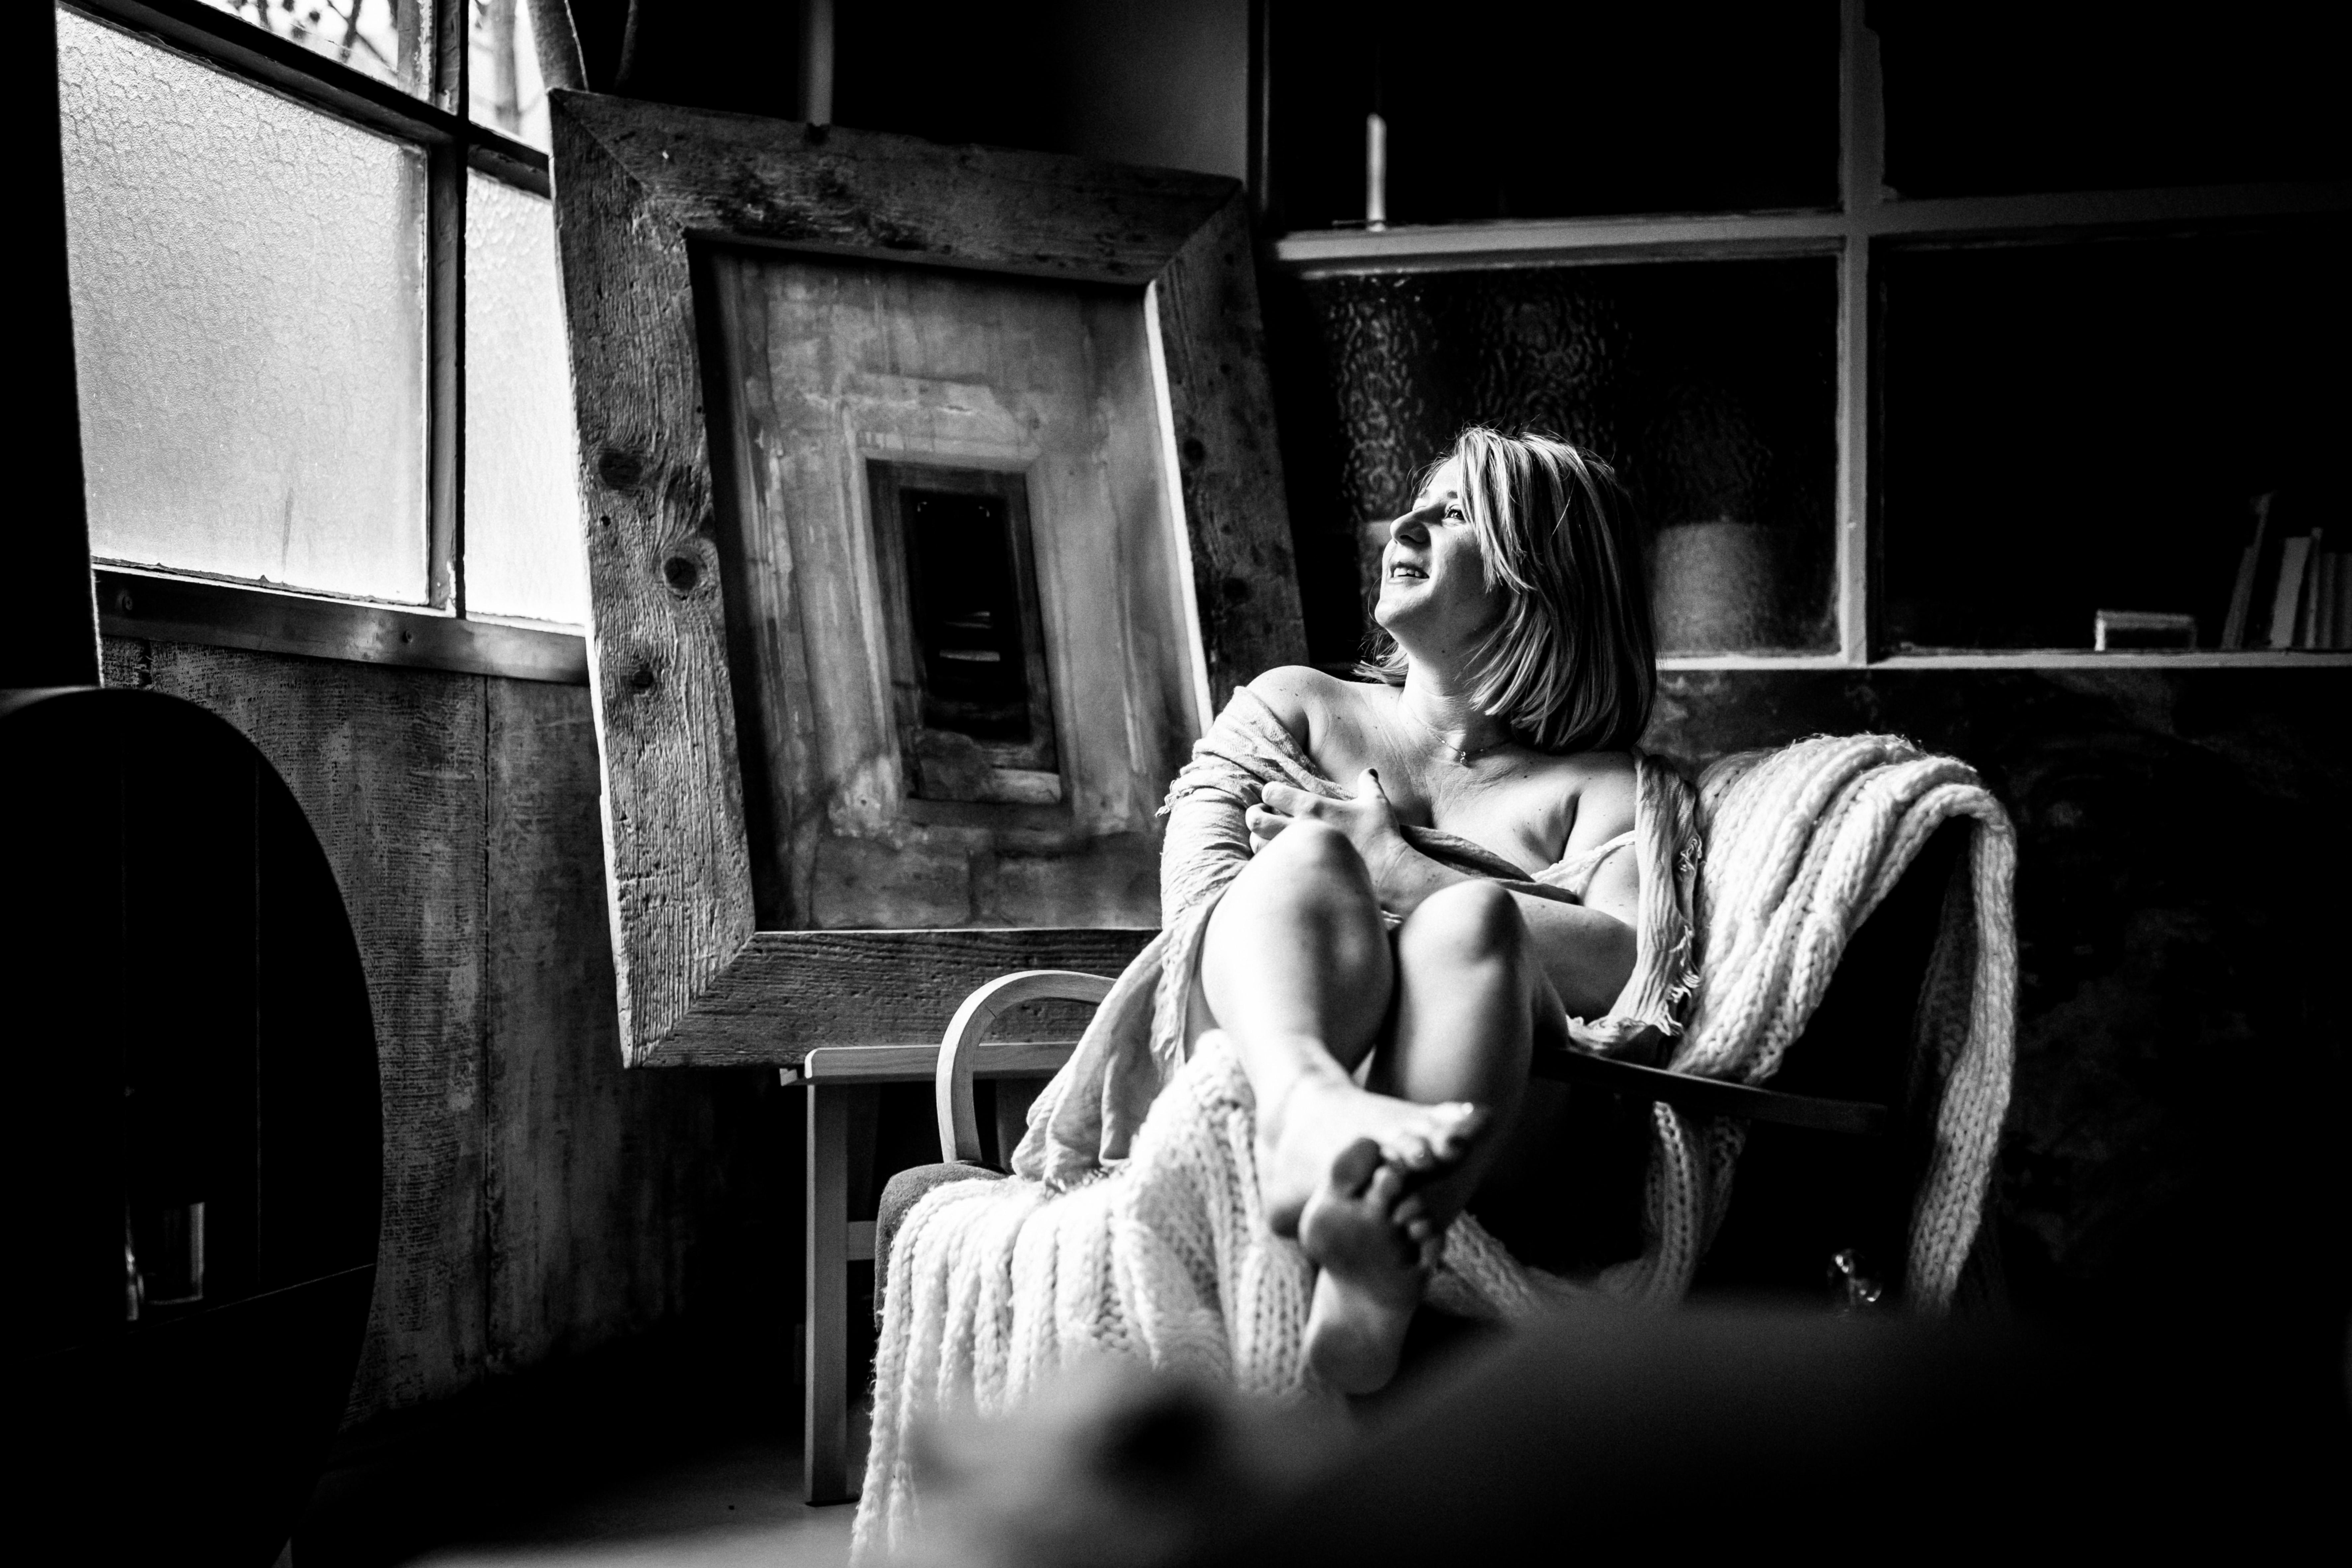 emilie k photographie photographe franche comt photographe de mariage grossesse enfance. Black Bedroom Furniture Sets. Home Design Ideas